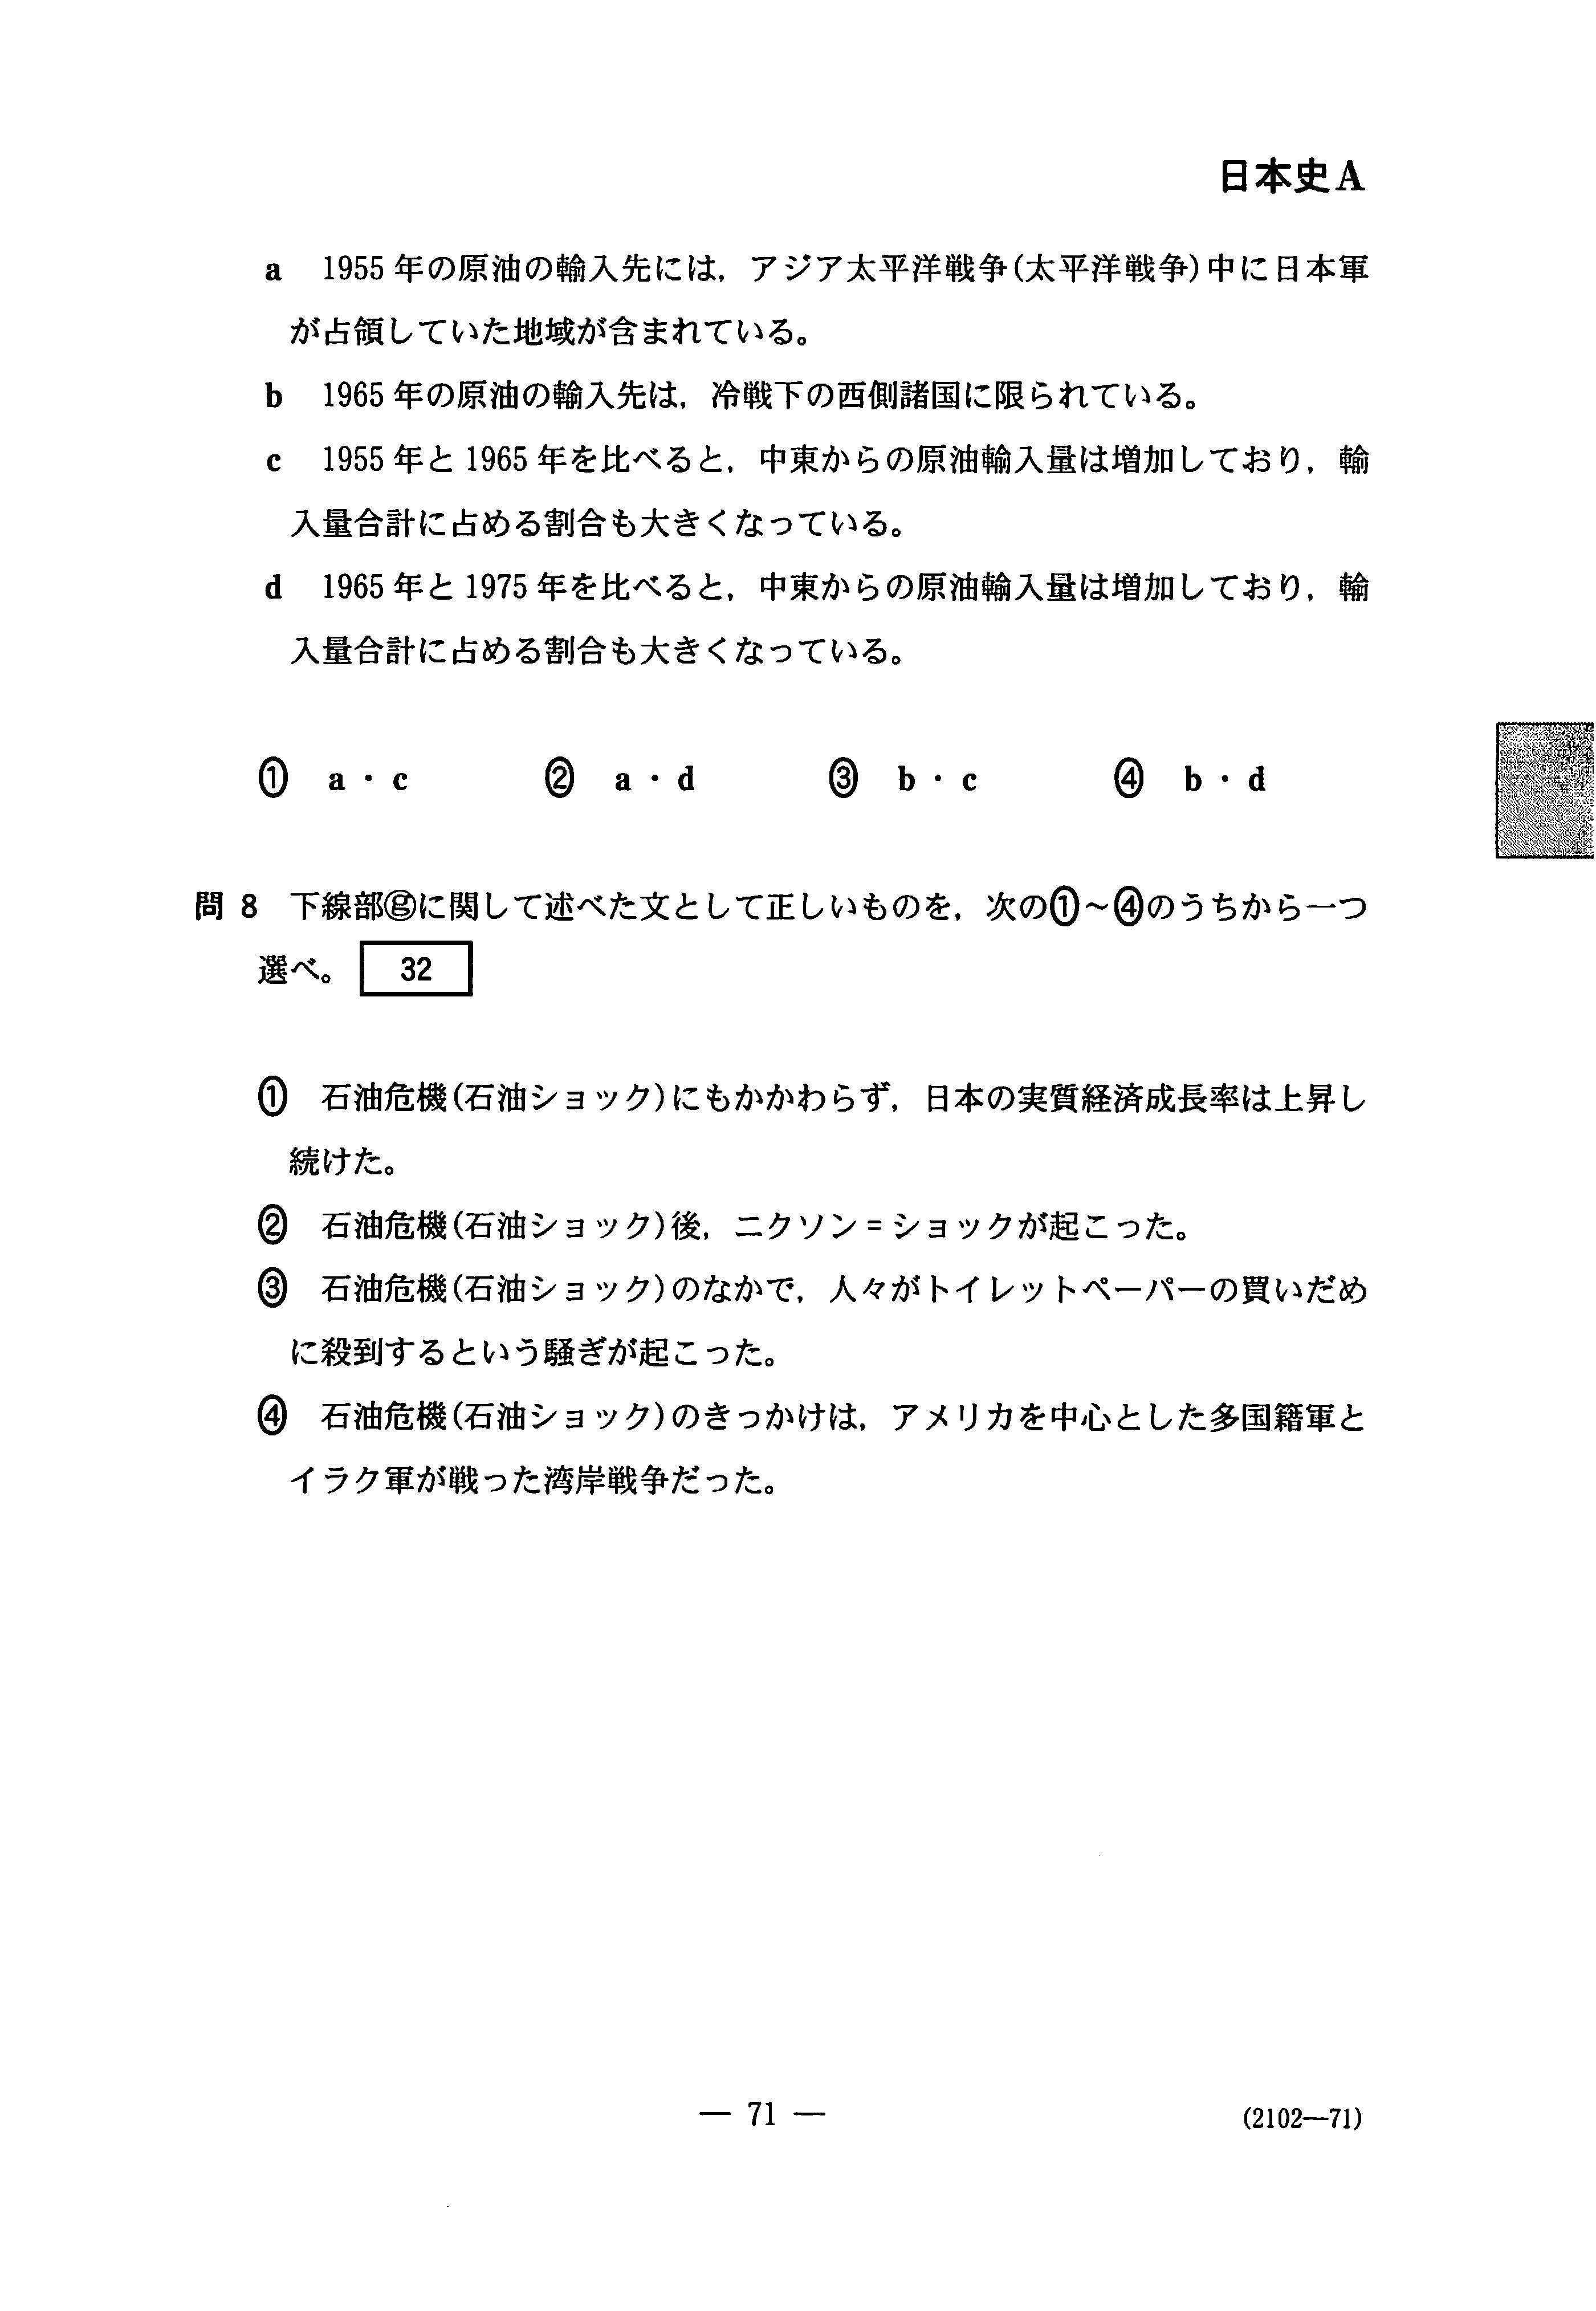 日本史A 地理歴史|2020年 令和2年 センター試験過去問題